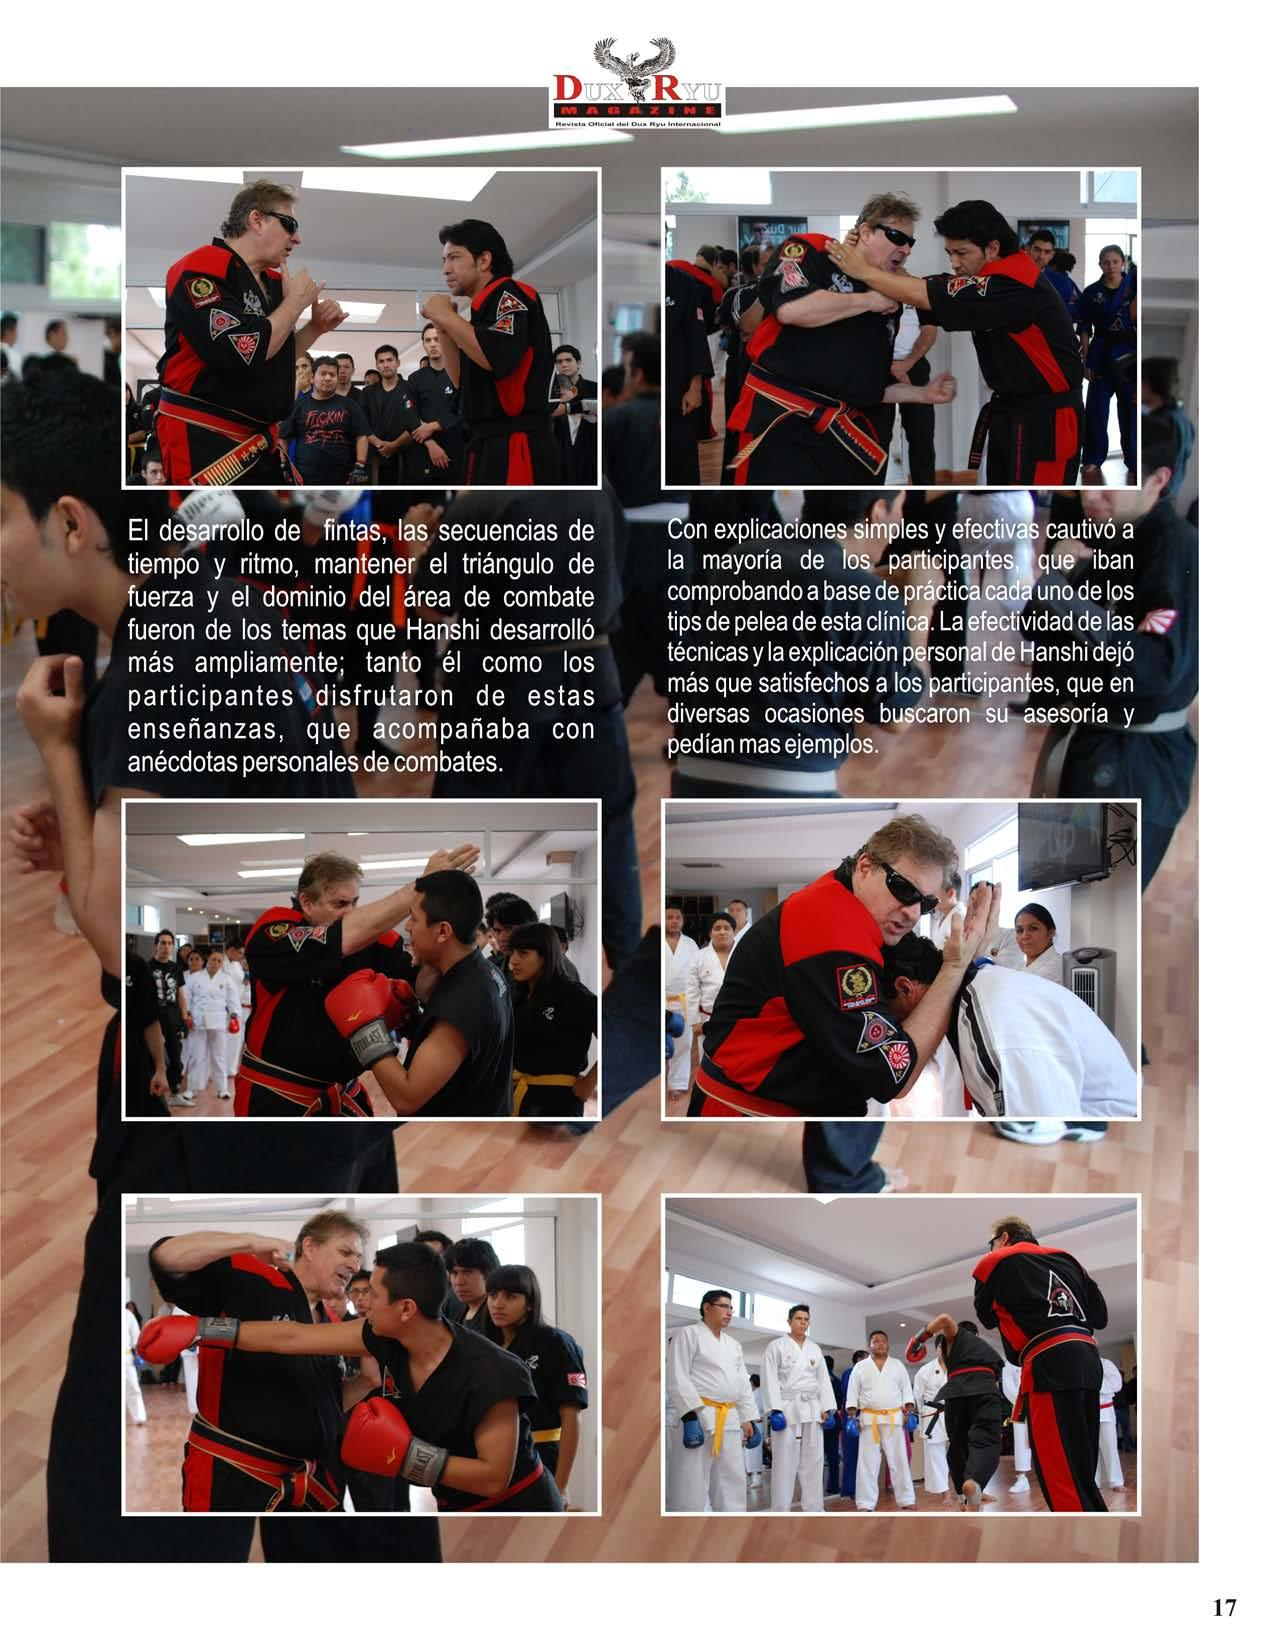 dux-ryu-magazine-4-page-019